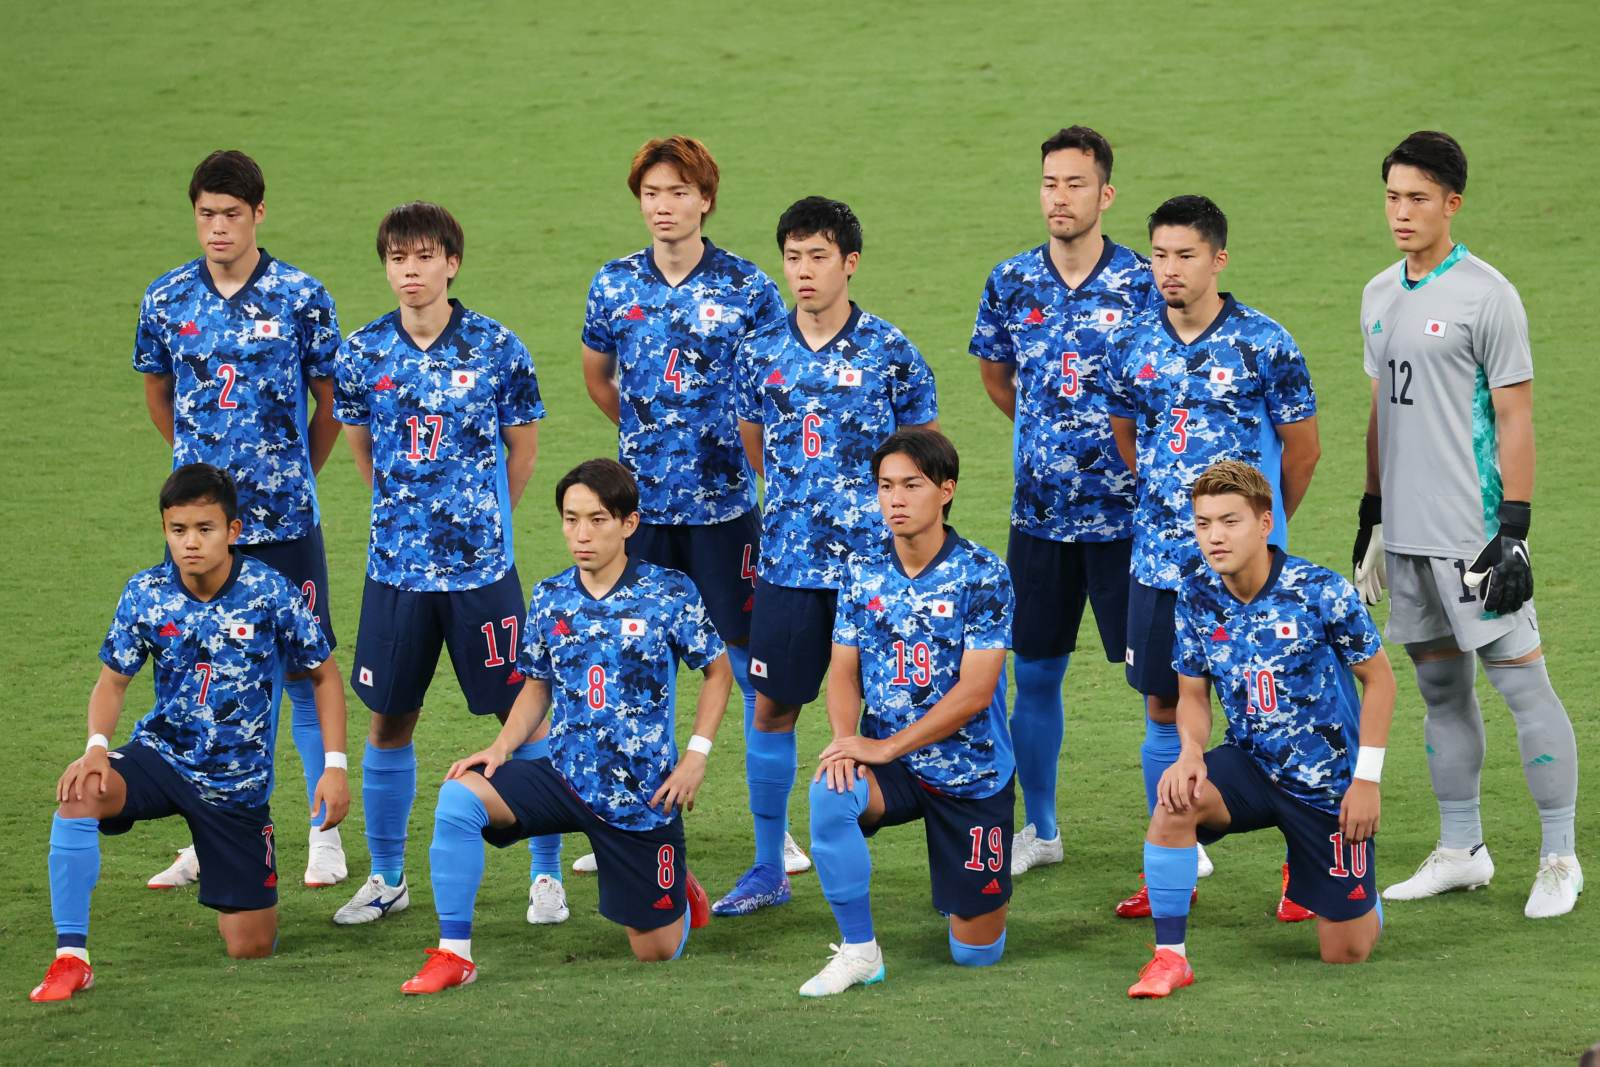 Япония – Австралия: прогноз на матч отборочного цикла чемпионата мира-2022 - 12 октября 2021